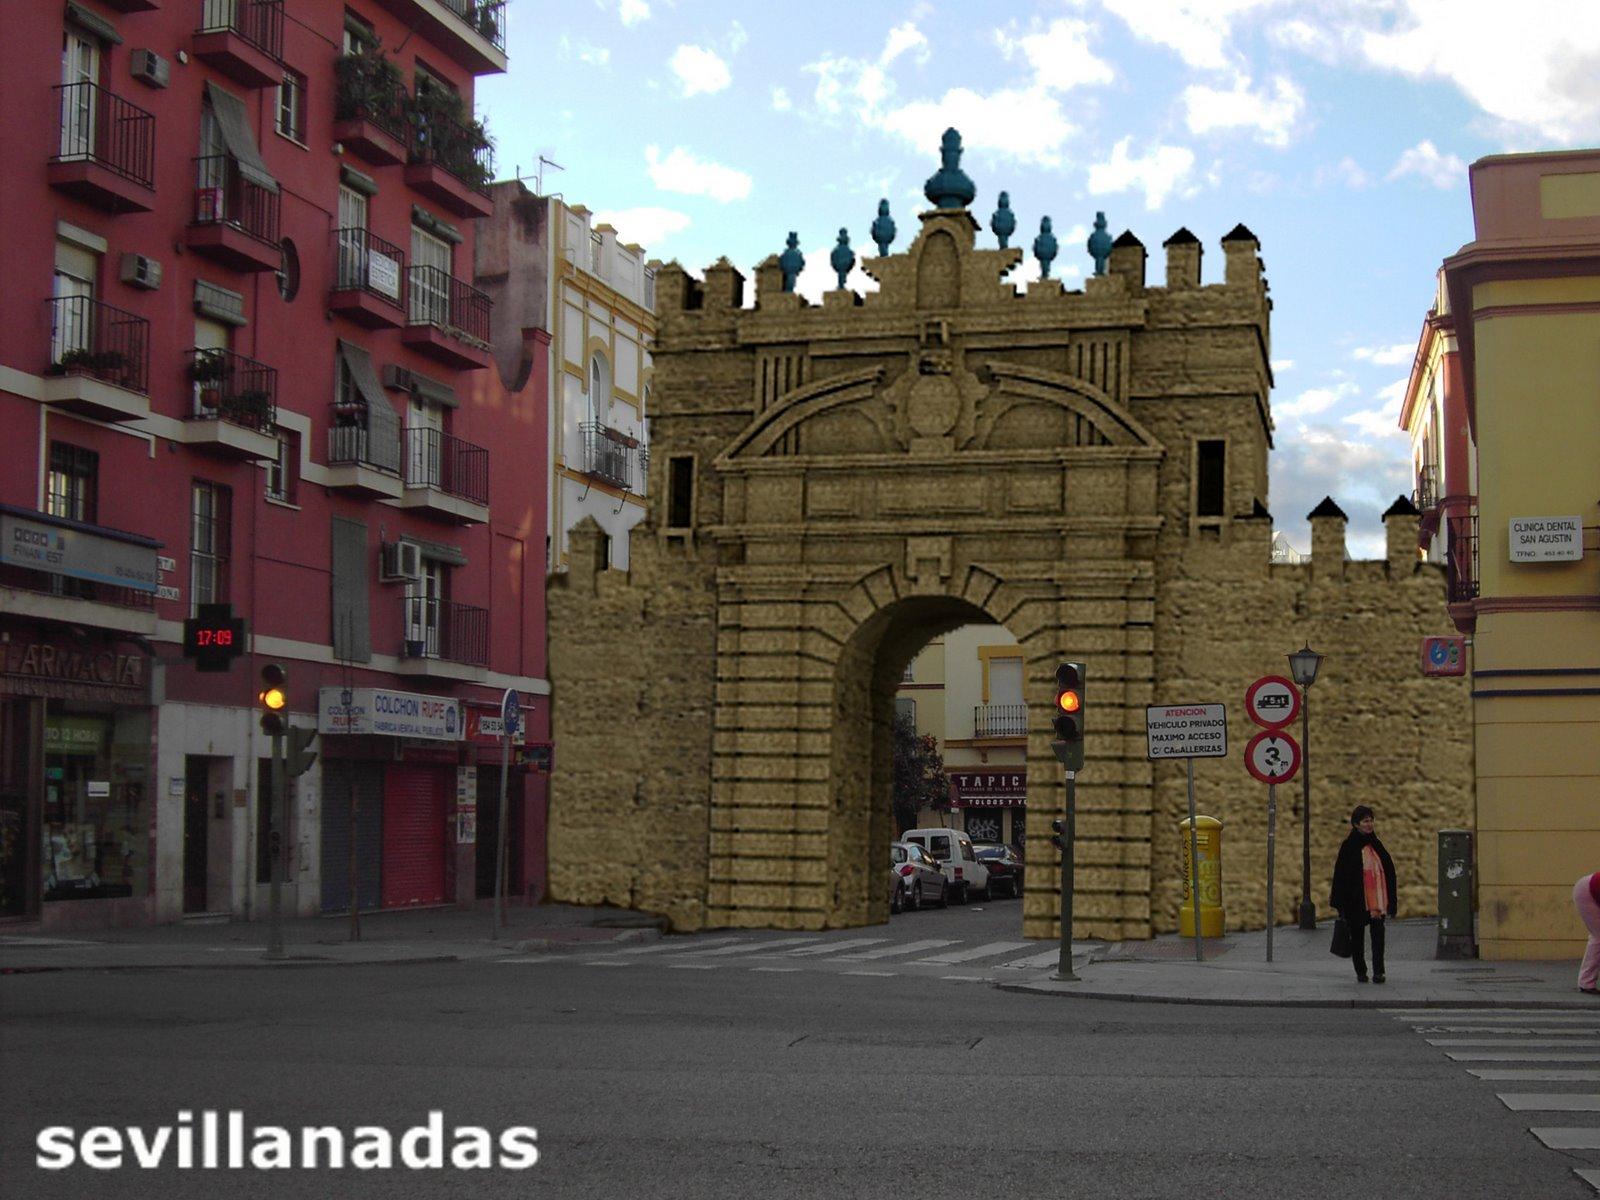 Sevilla desaparecida sevillanadas sevilla en estampas - Puerta de sevilla carmona ...